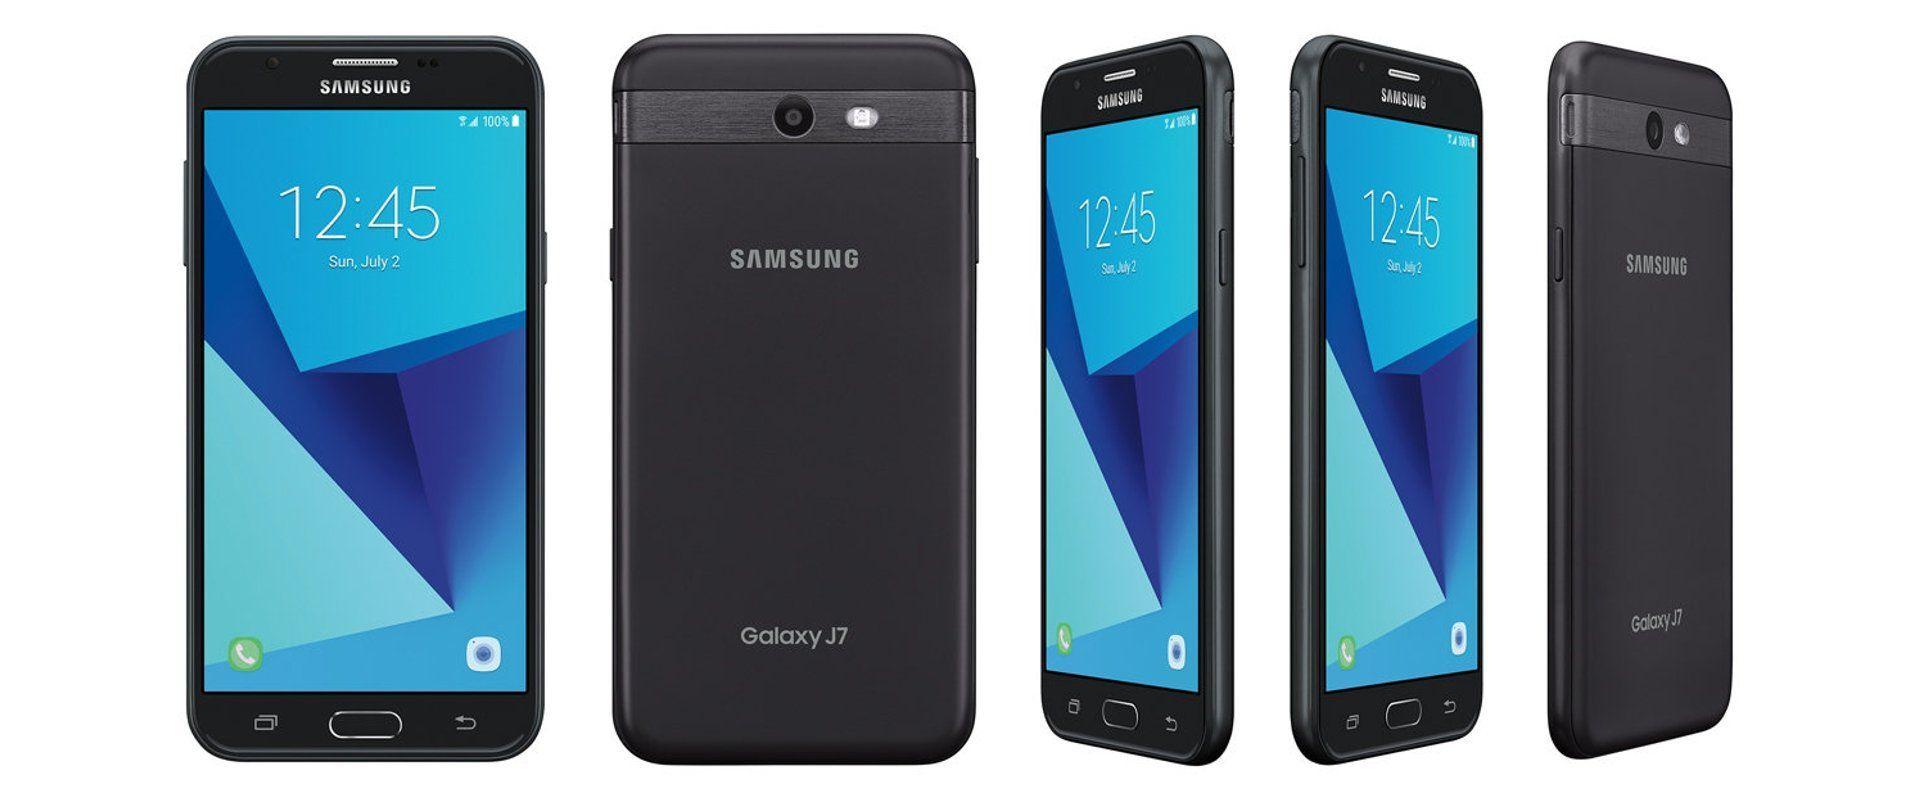 Samsung Galaxy J7 (2017) (Dual SIM)